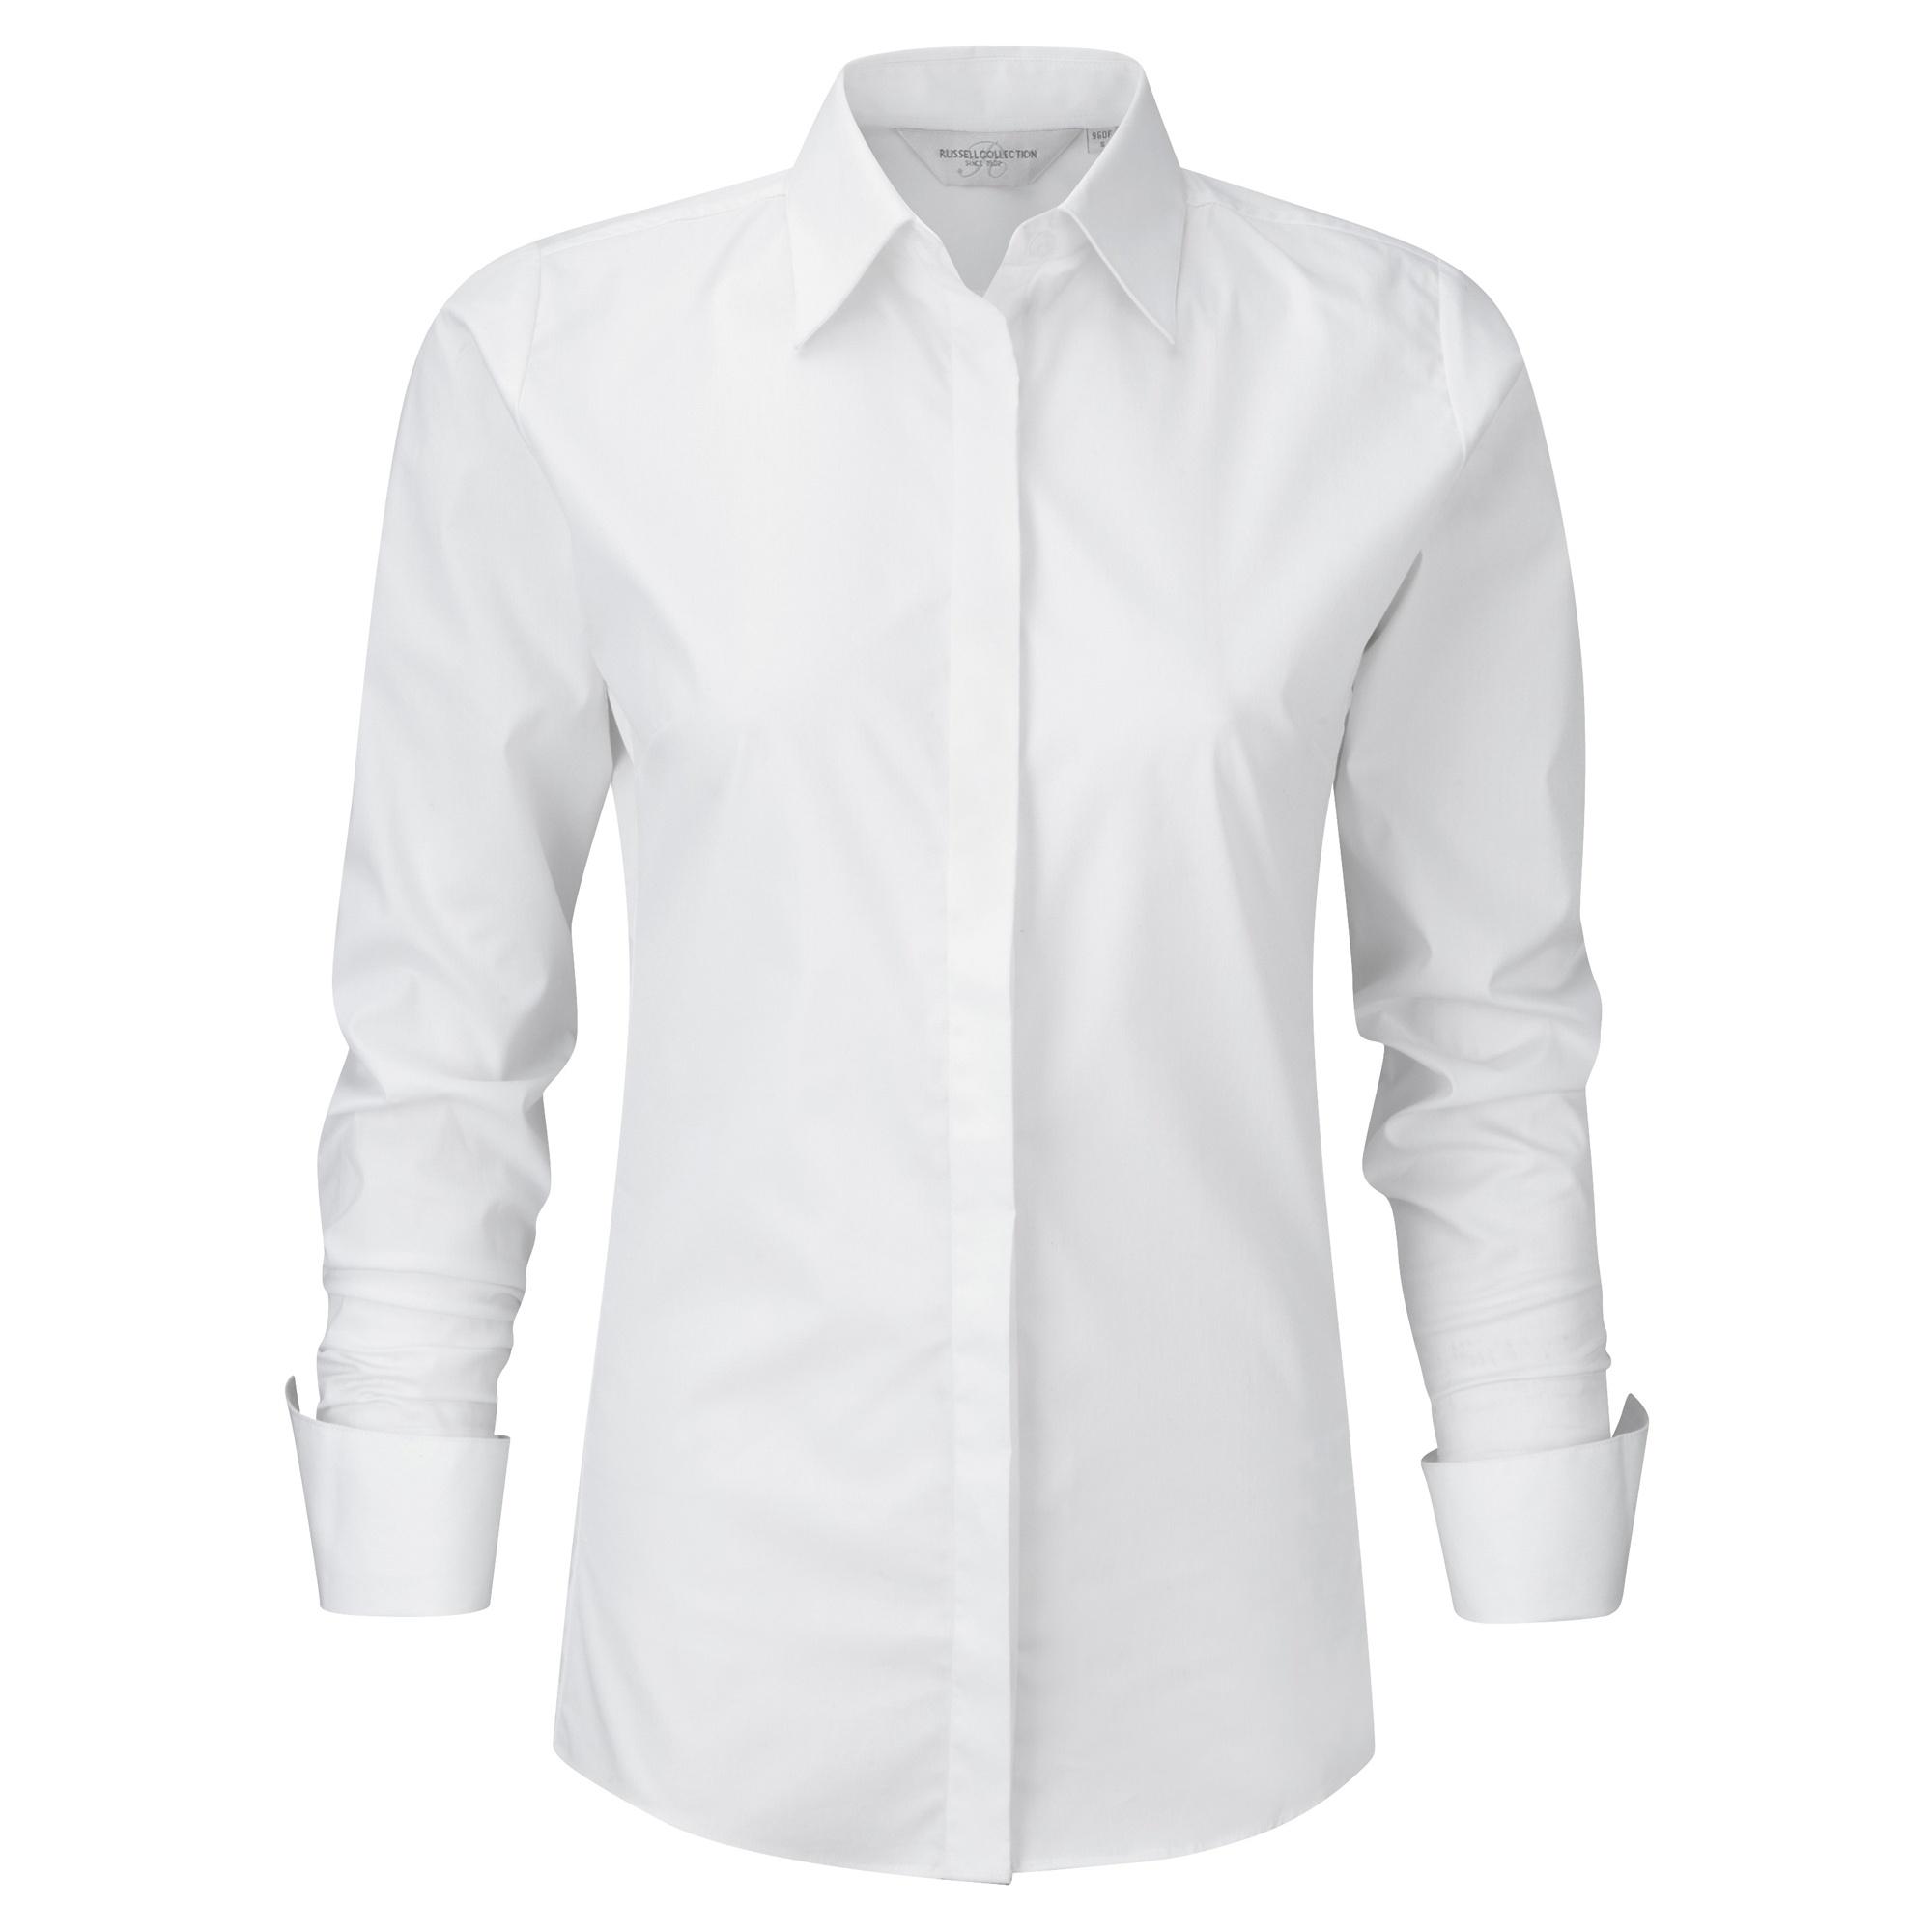 Russell Ladies/Womens Stretch Moisture Management Work Shirt (XS) (White)